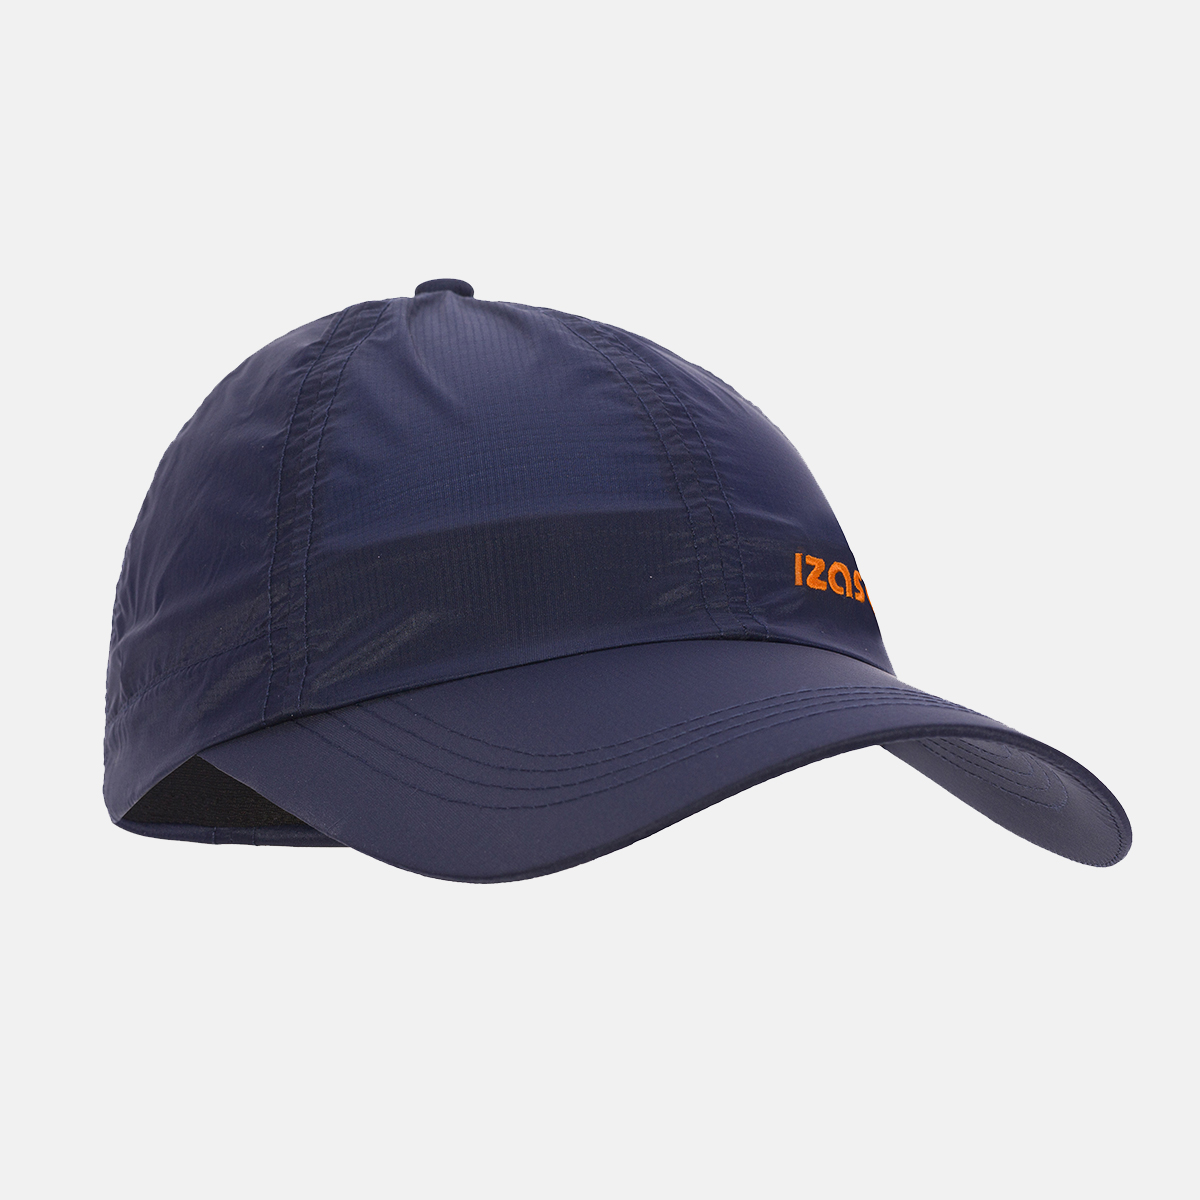 UNISEX'S TREKK ULTRALIGHT MICROFIBER CAP BLUE